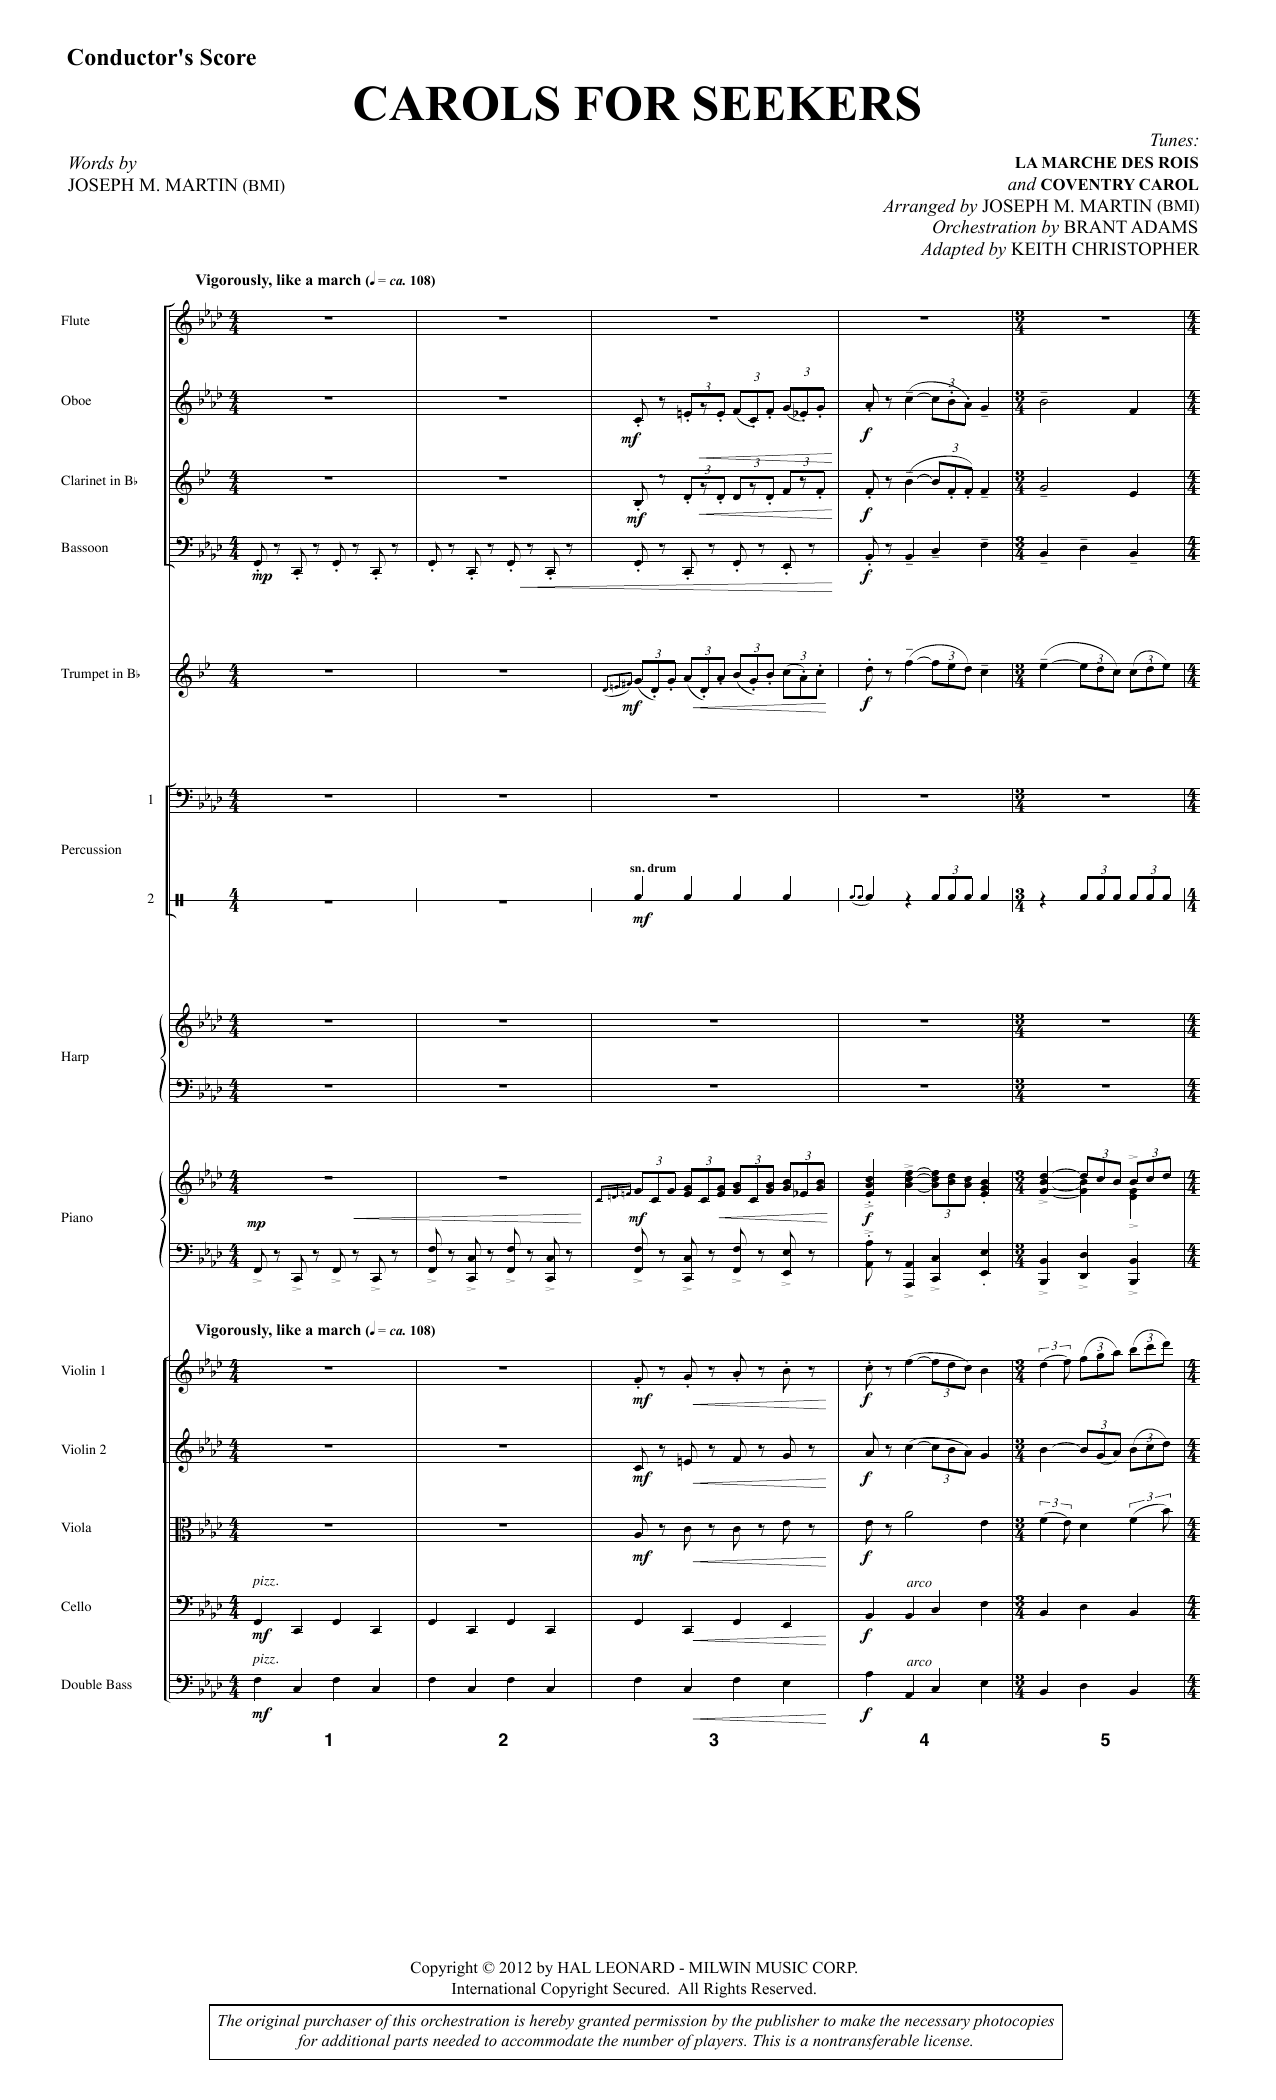 Joseph M. Martin Carols for Seekers - Full Score sheet music notes and chords. Download Printable PDF.